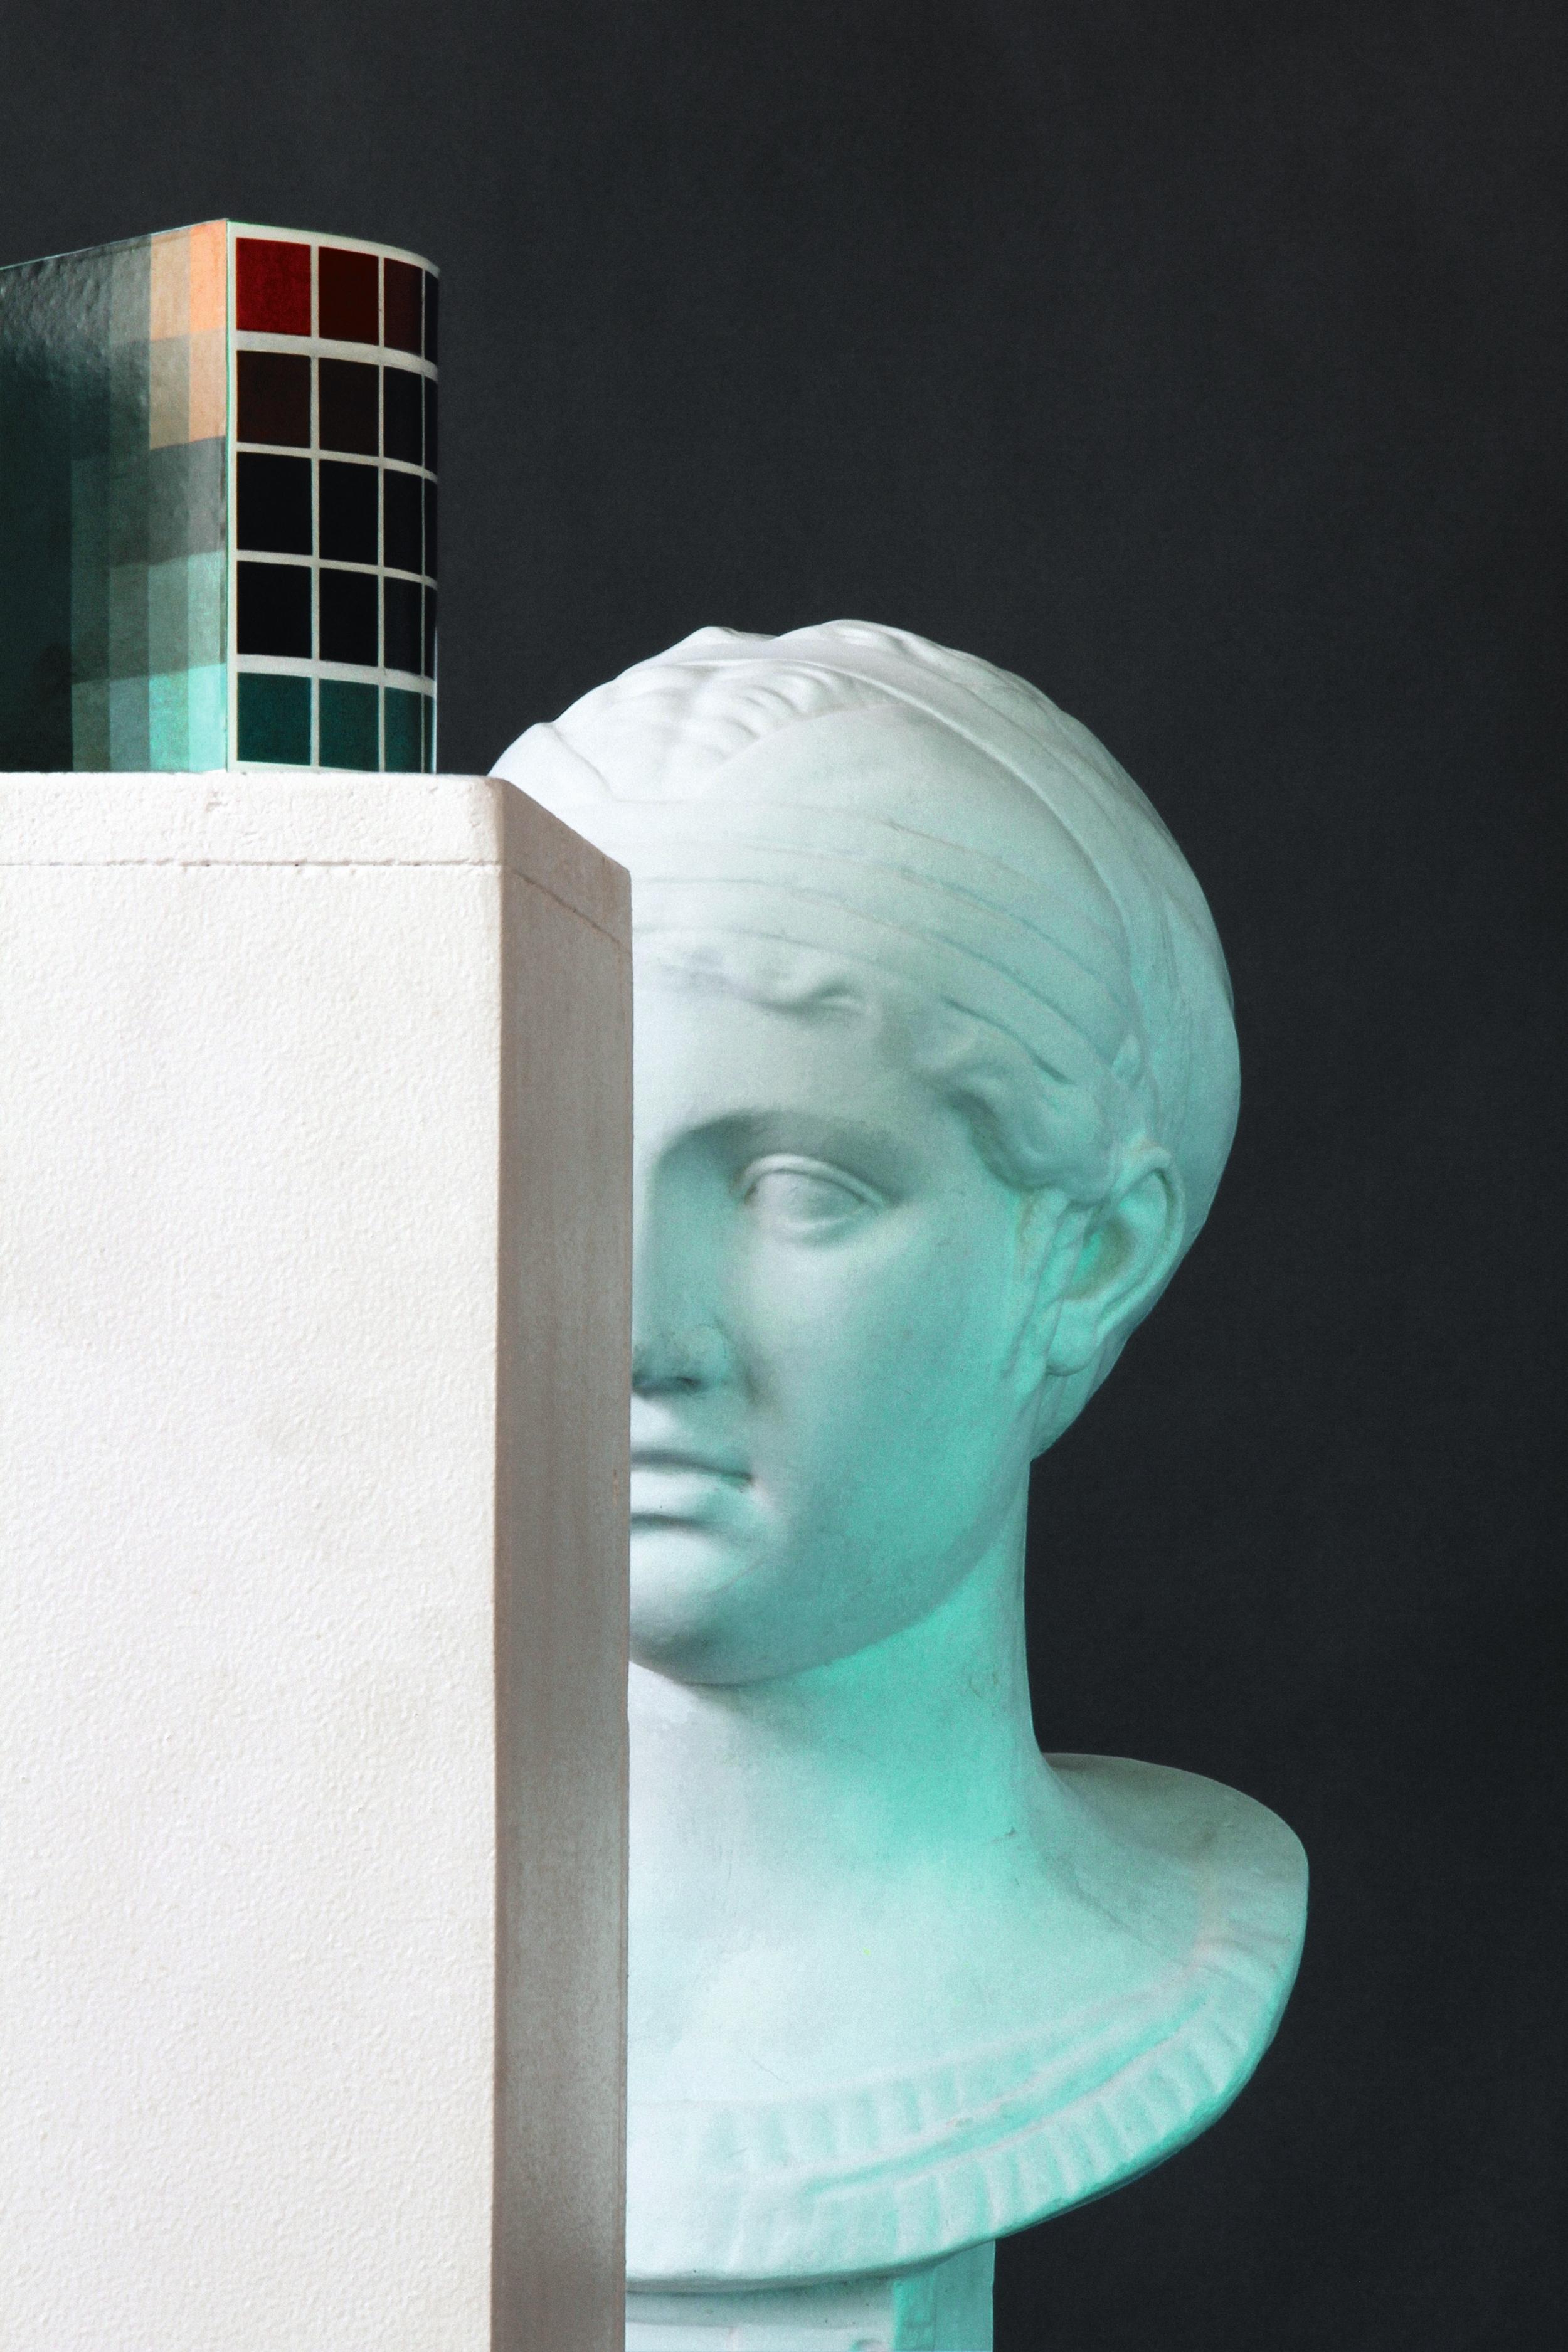 Pixel-head 2011, Epson fine art print, 50 x 35 cm, Ed. of 5 + 3 AP